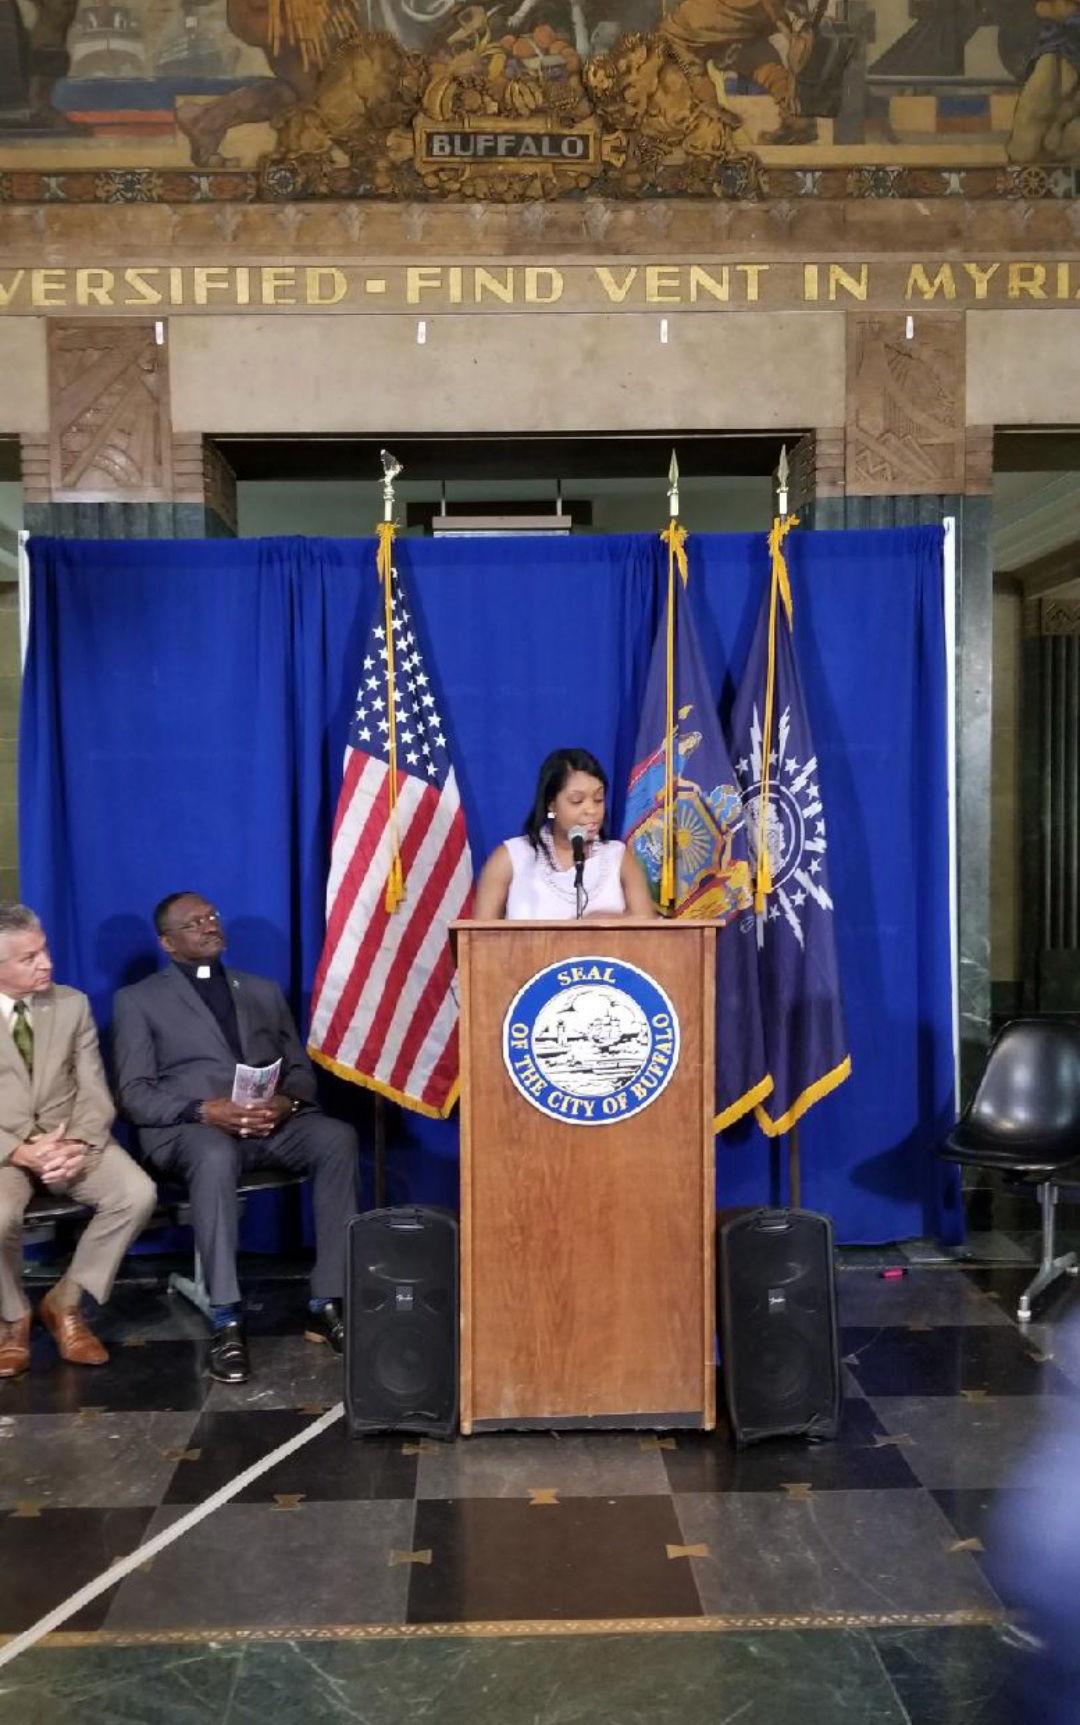 Erin speaking at Buffalo City Hall